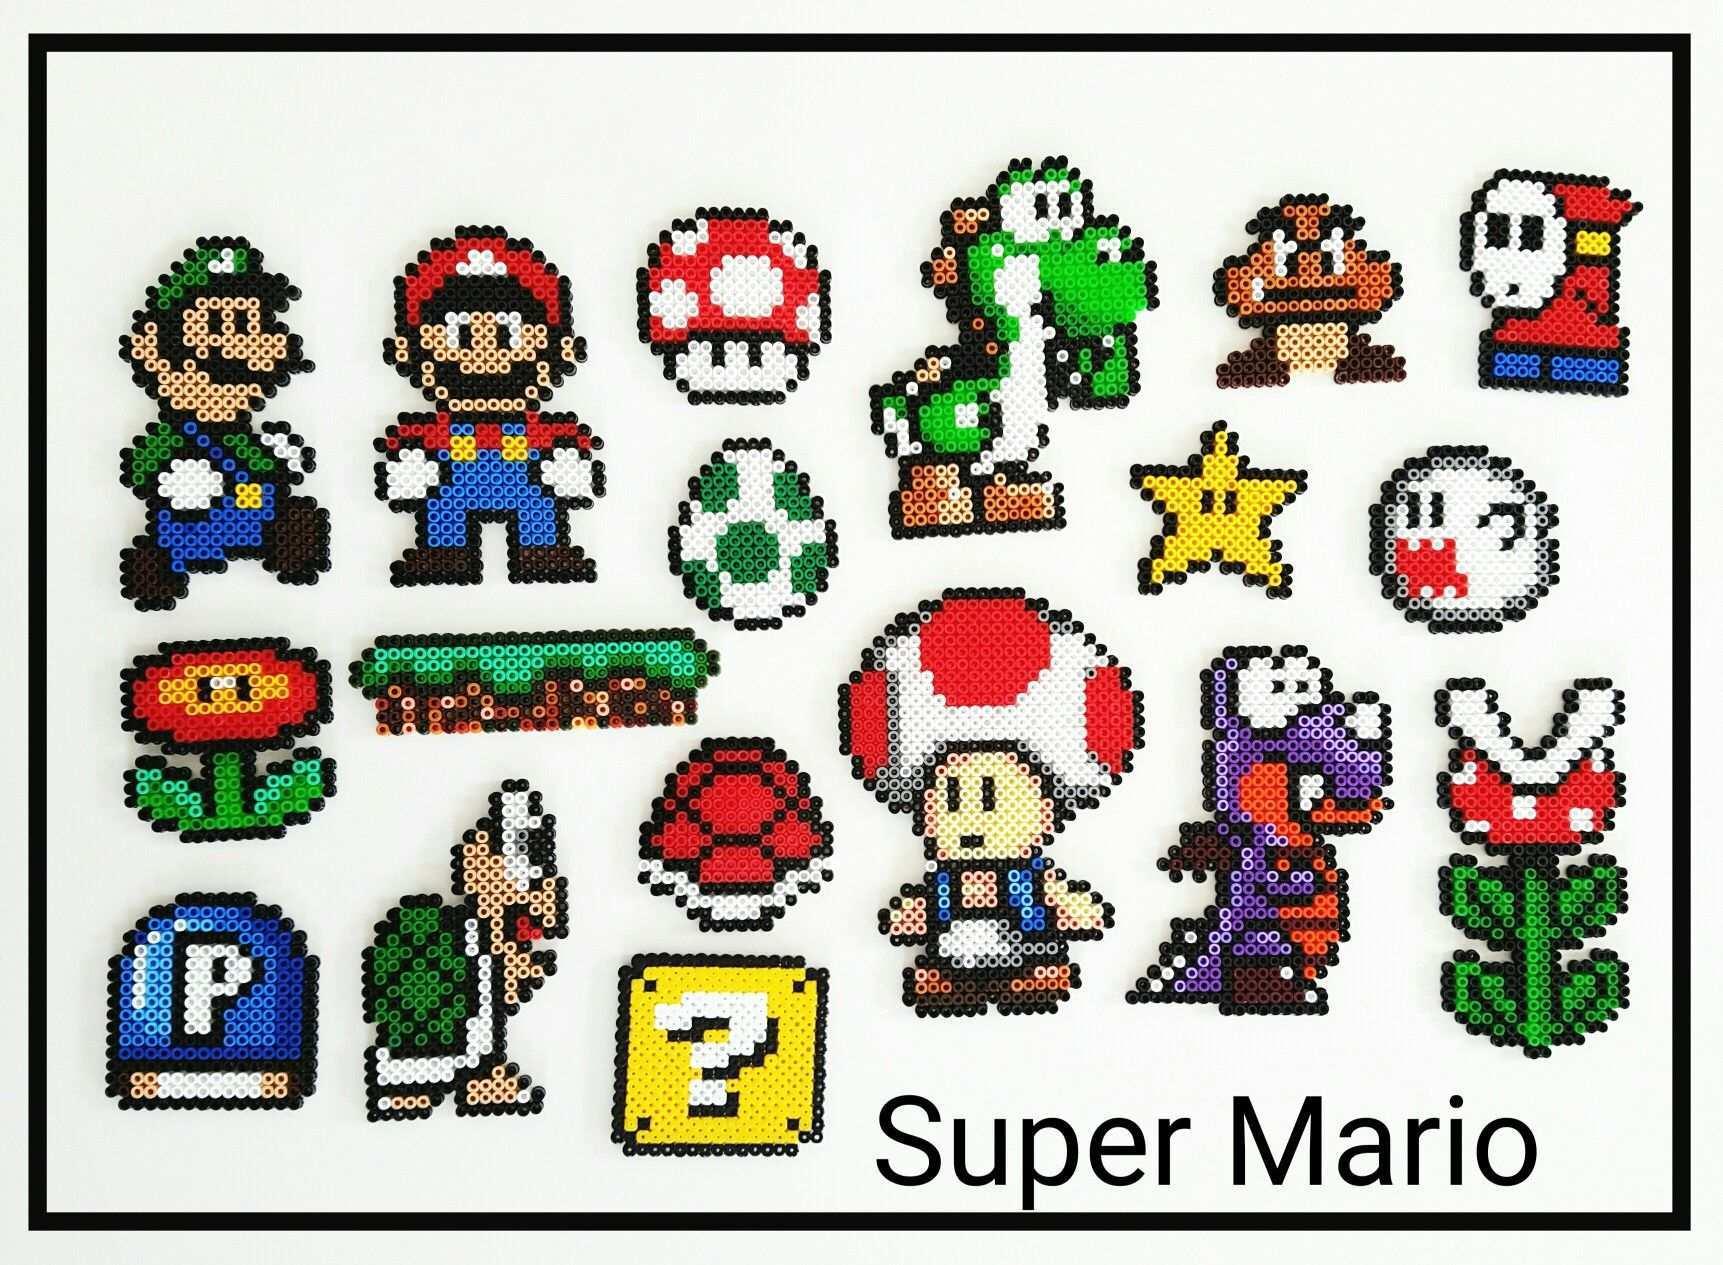 Tolle Bugelperlen Charaktere Aus Super Mario Supermario Bugelperlen Hama Hamabeads Yoshi Basteln Super Mario Geschenkideen